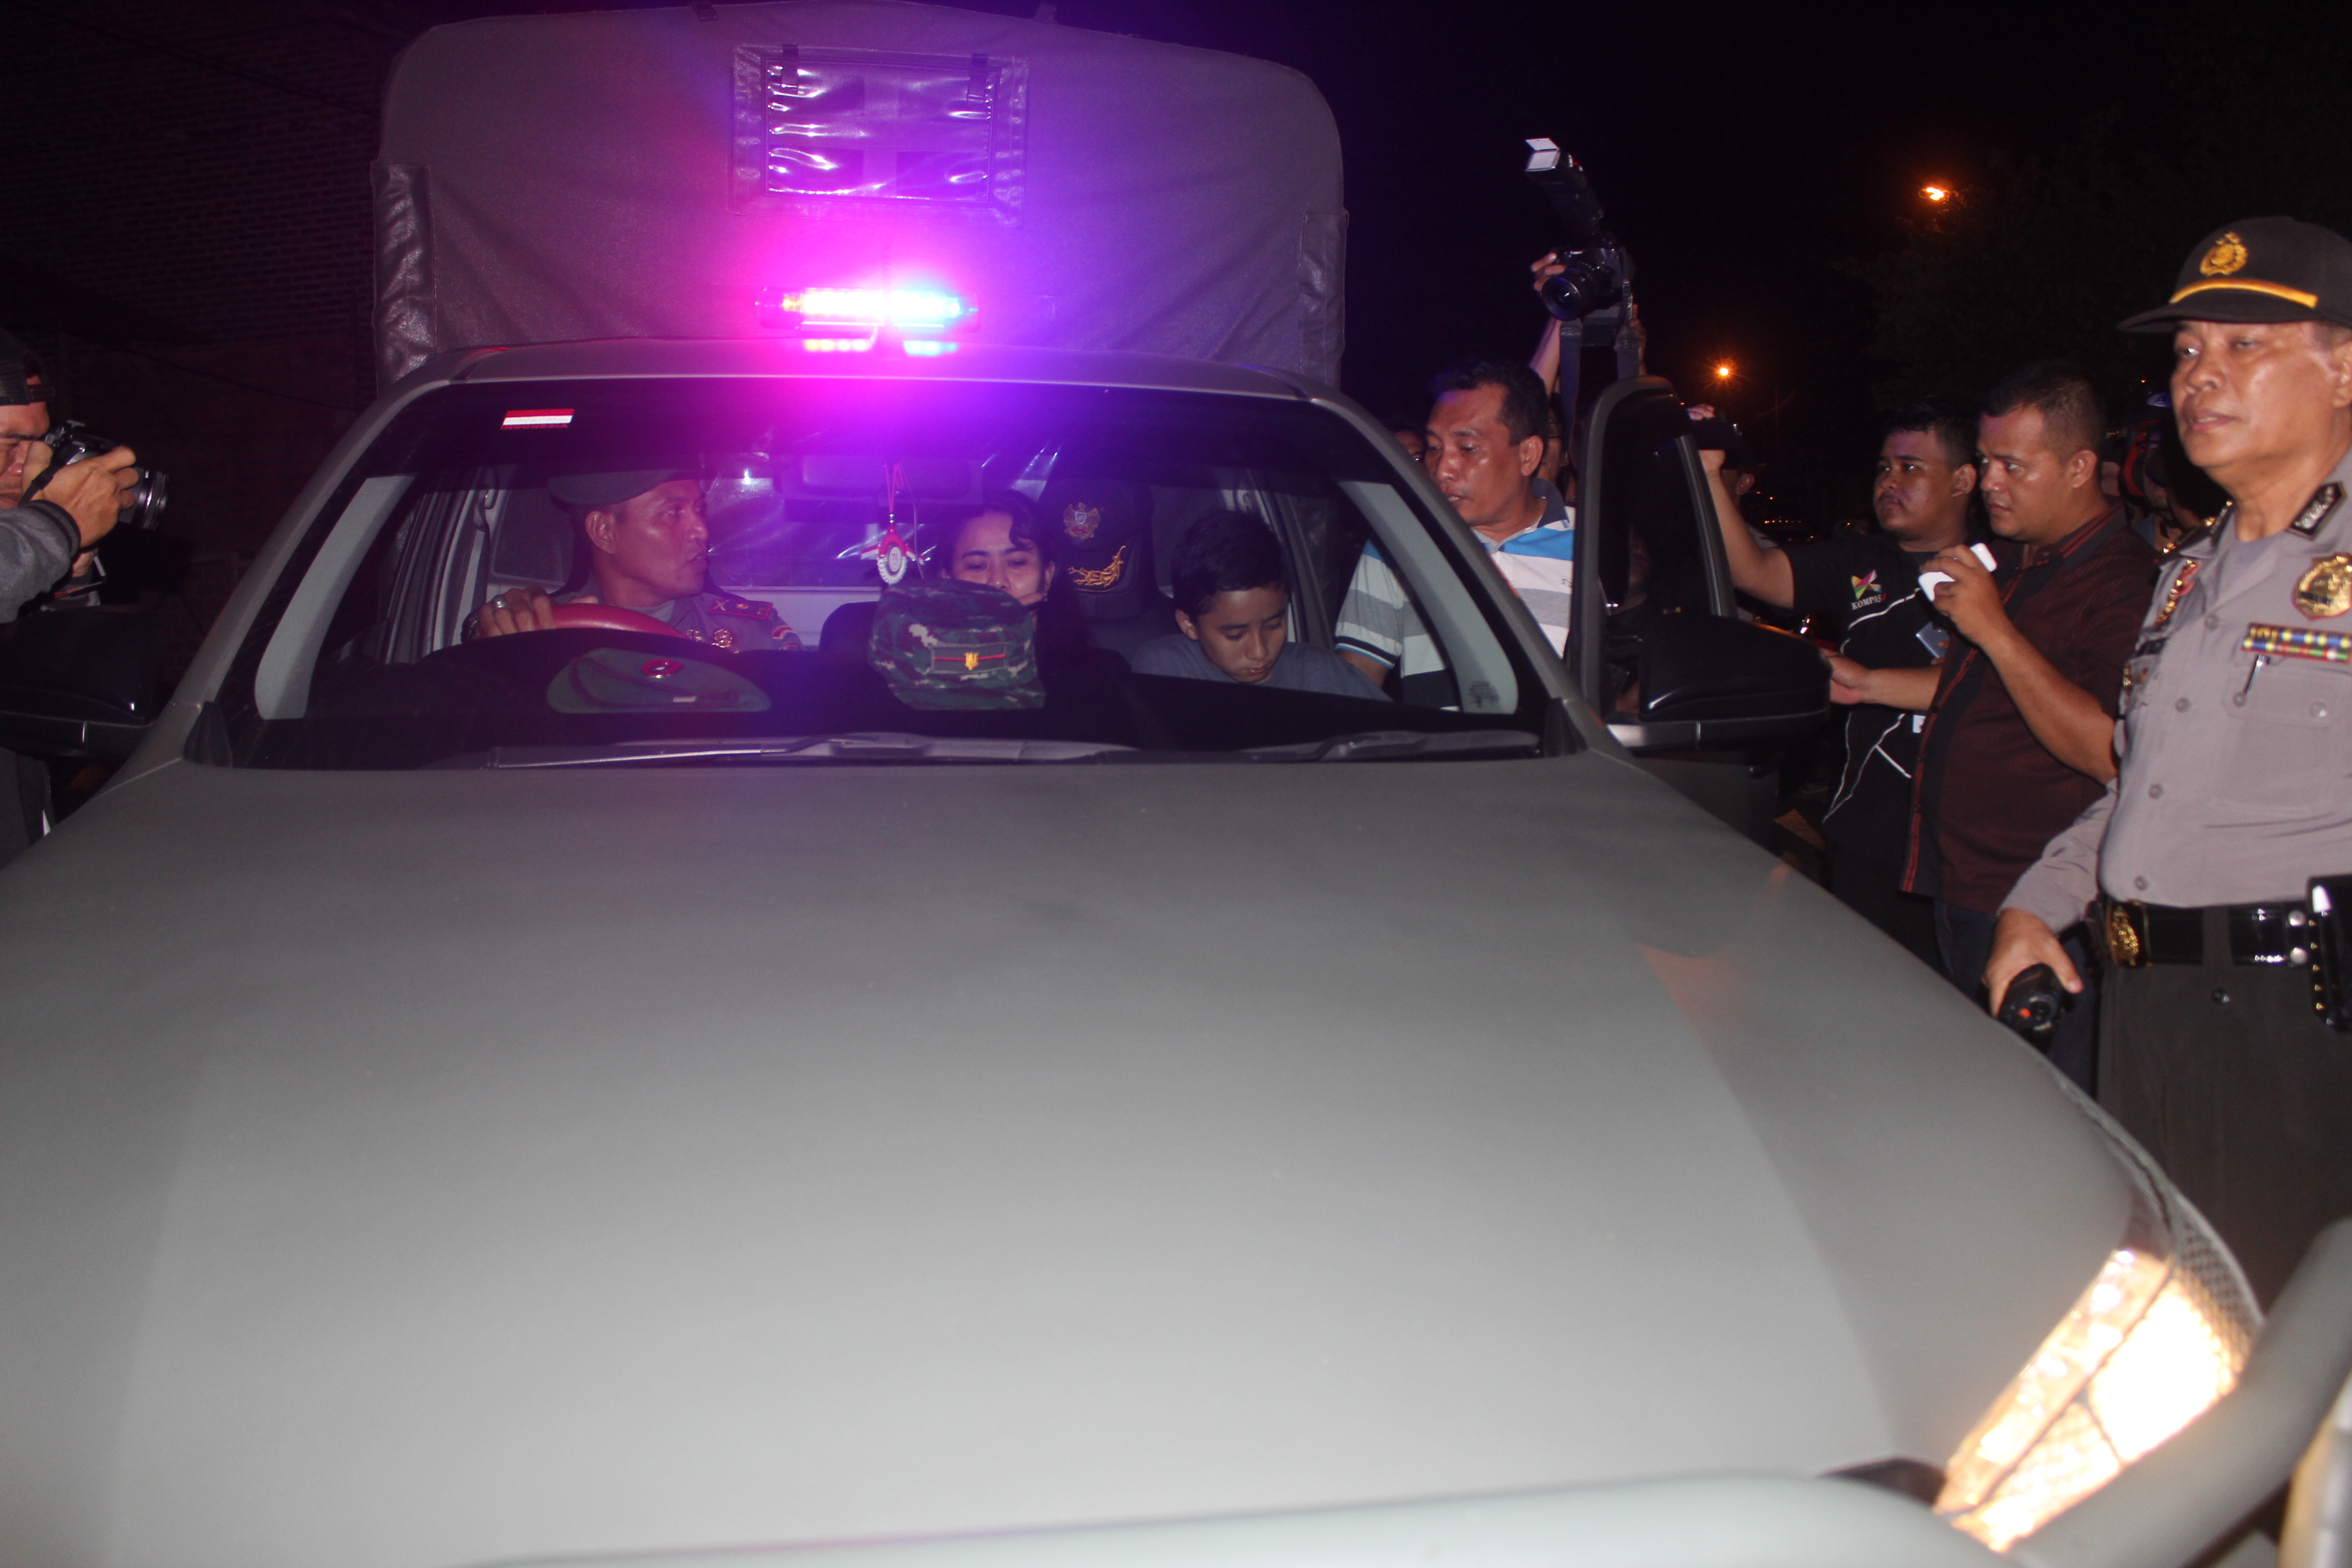 Jeritan Wanita Dari Dalam Gudang, Ini Kata Polisi